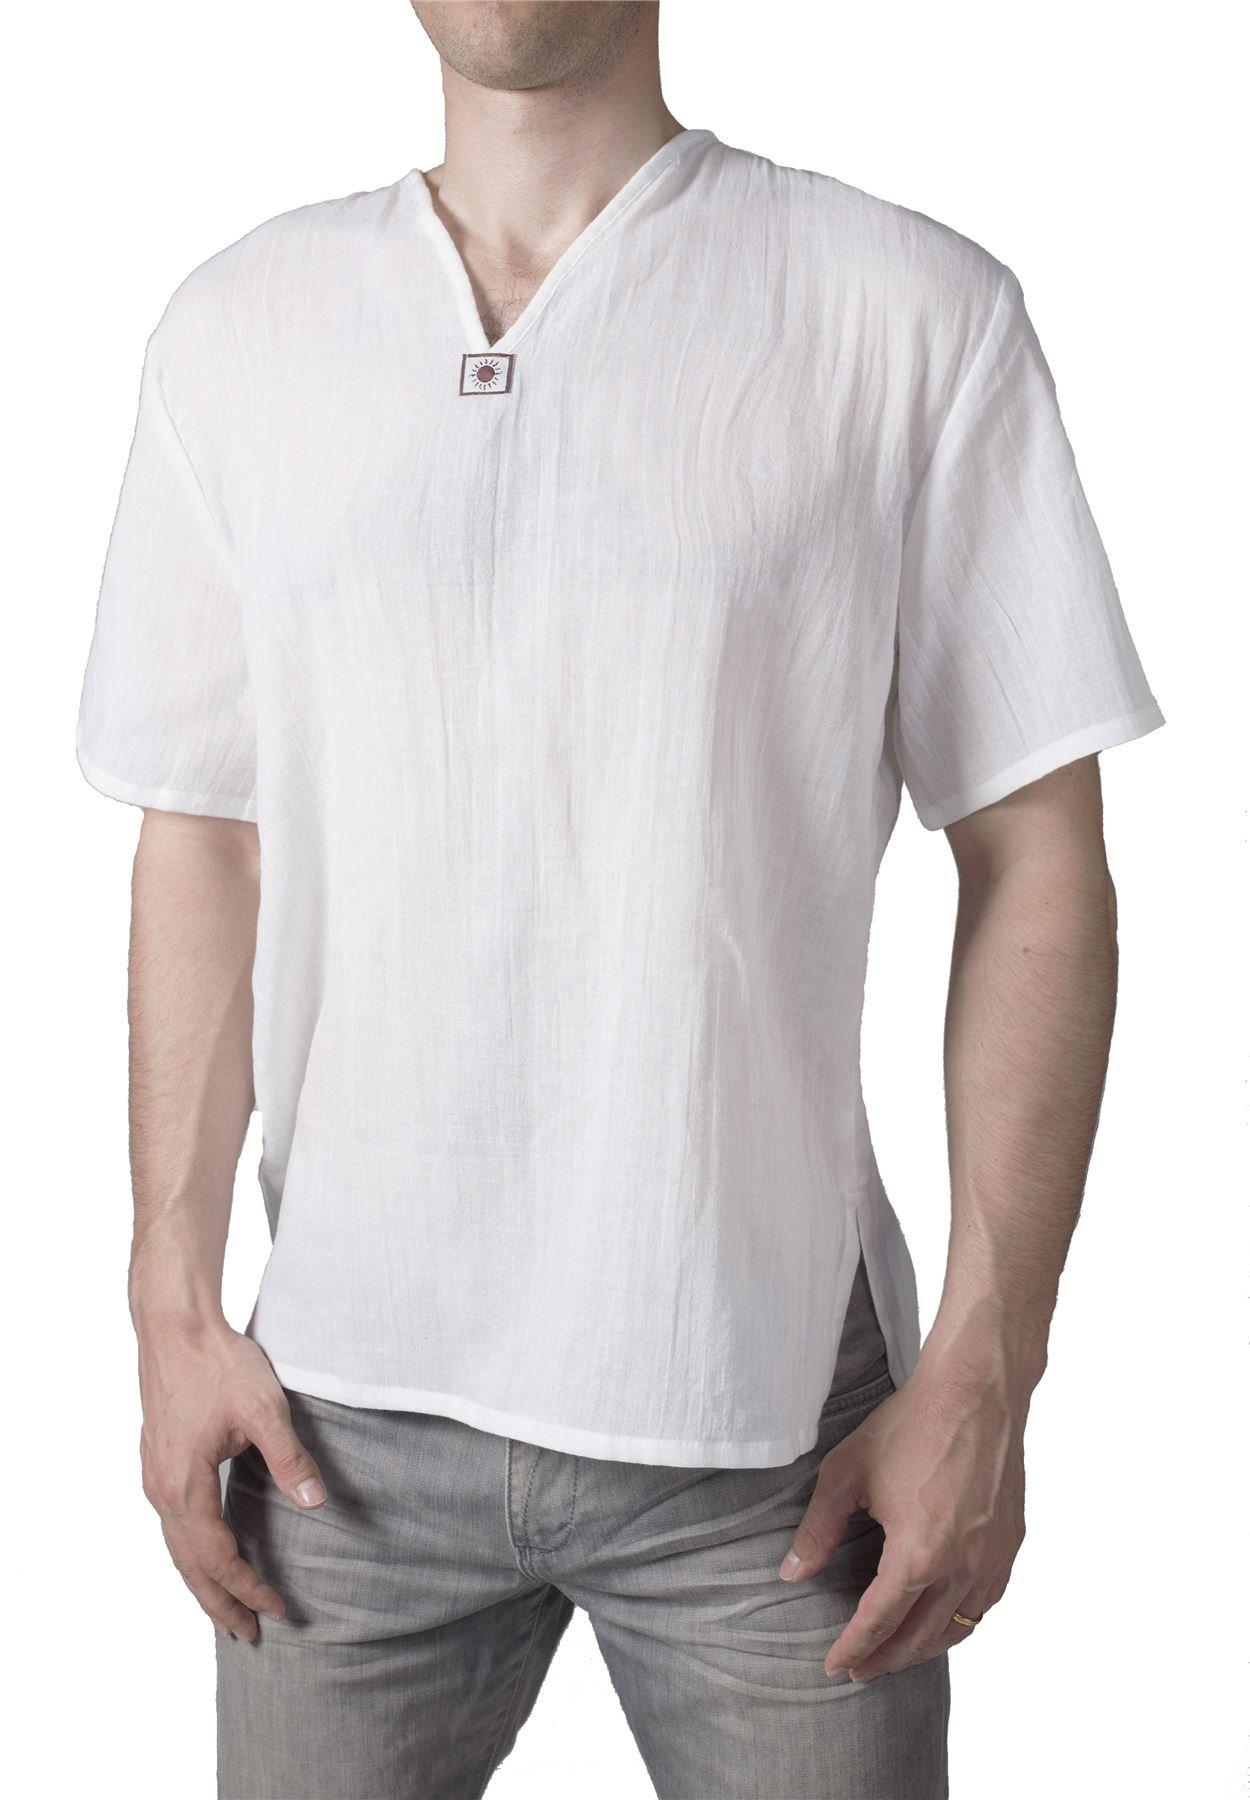 Lofbaz Men's V-Neck T-Shirt Short Sleeve 100% Cotton Thai Hippie White Size L